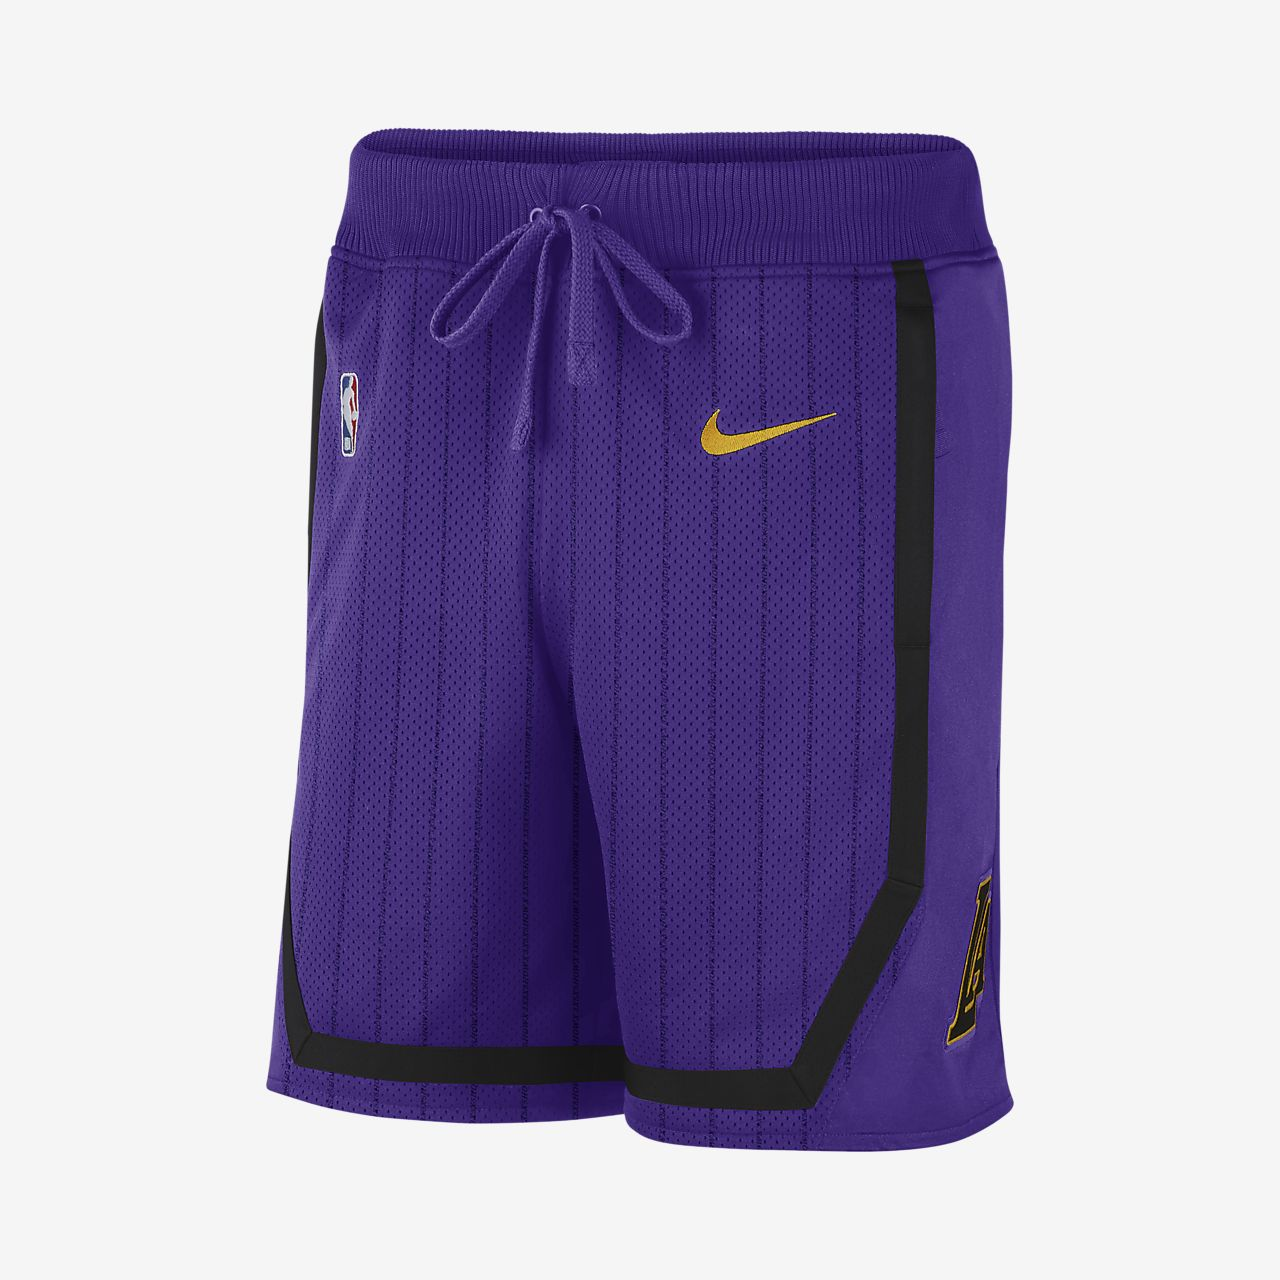 bf7e6d864 Los Angeles Lakers Nike Courtside Men s NBA Shorts. Nike.com CA